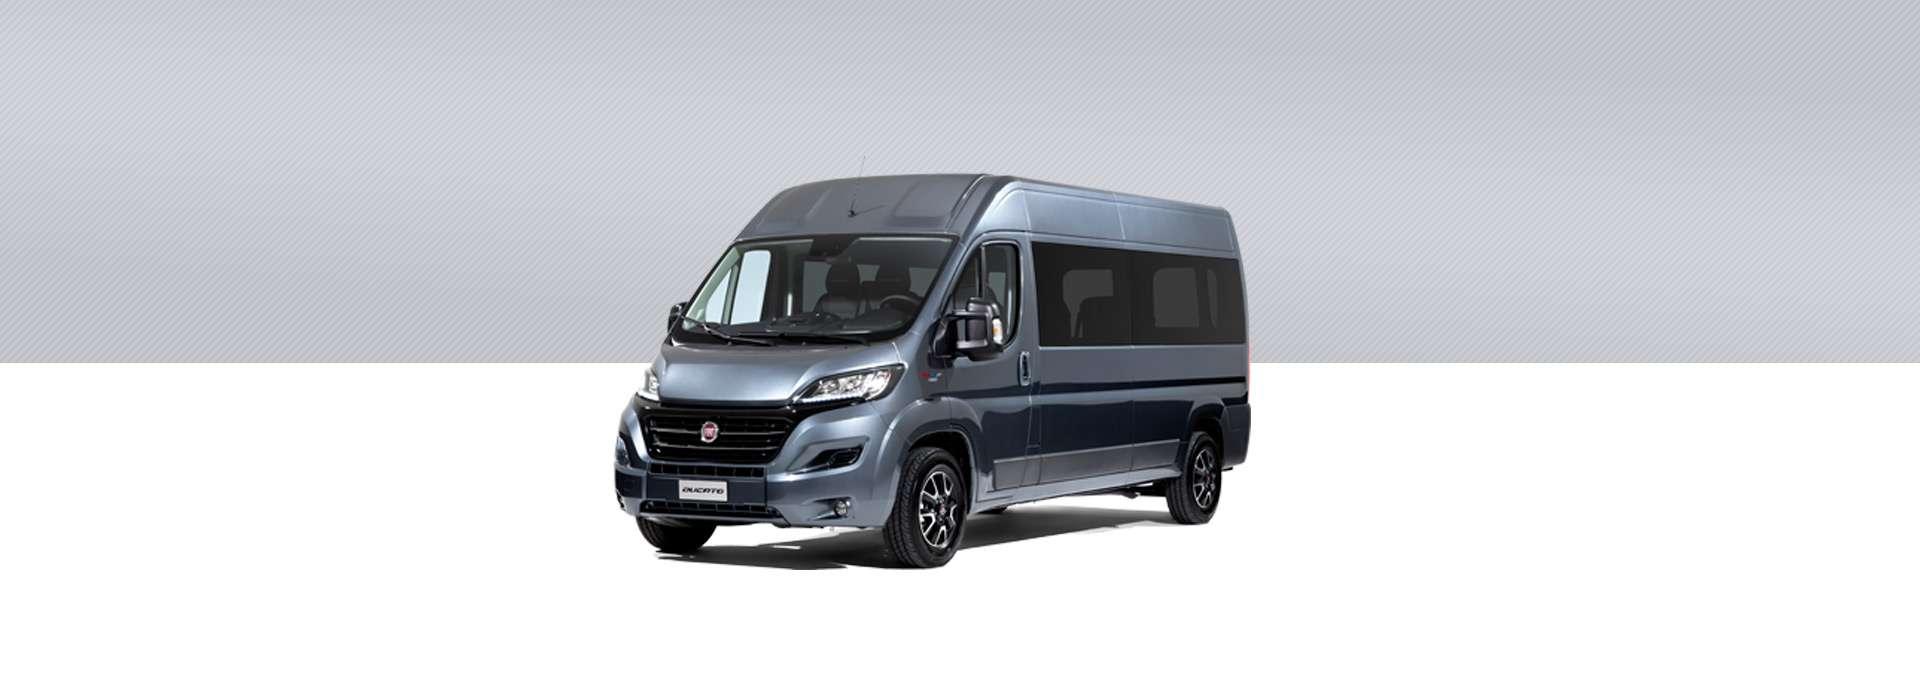 Fiat Ducato Transporte de personas